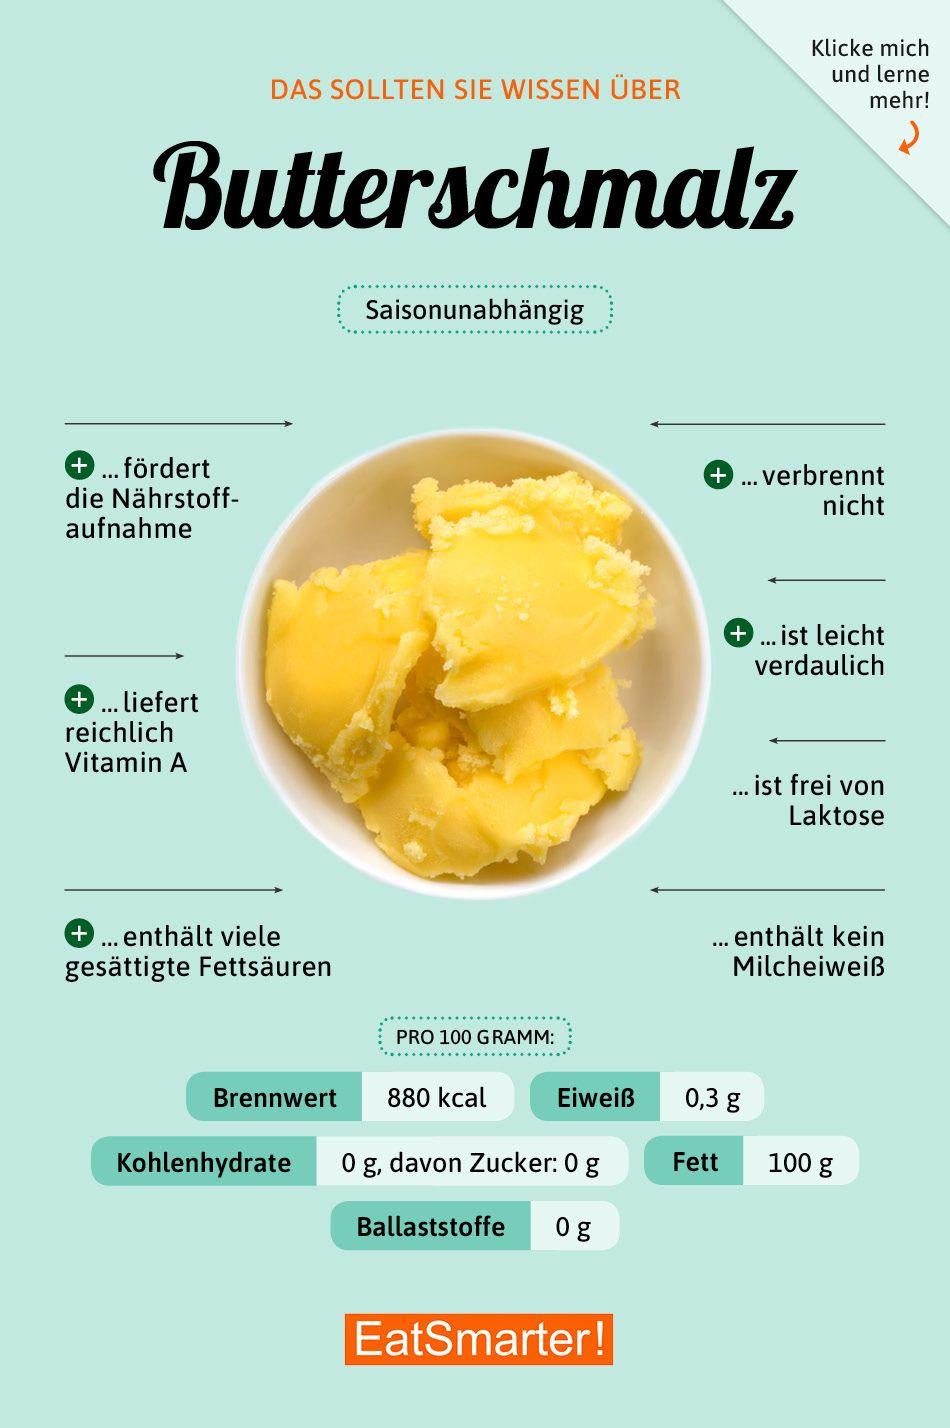 Das solltest du über Butterschmalz wissen | eatsmarter.de #ernährung #infografik #butterschmalz #vitamins